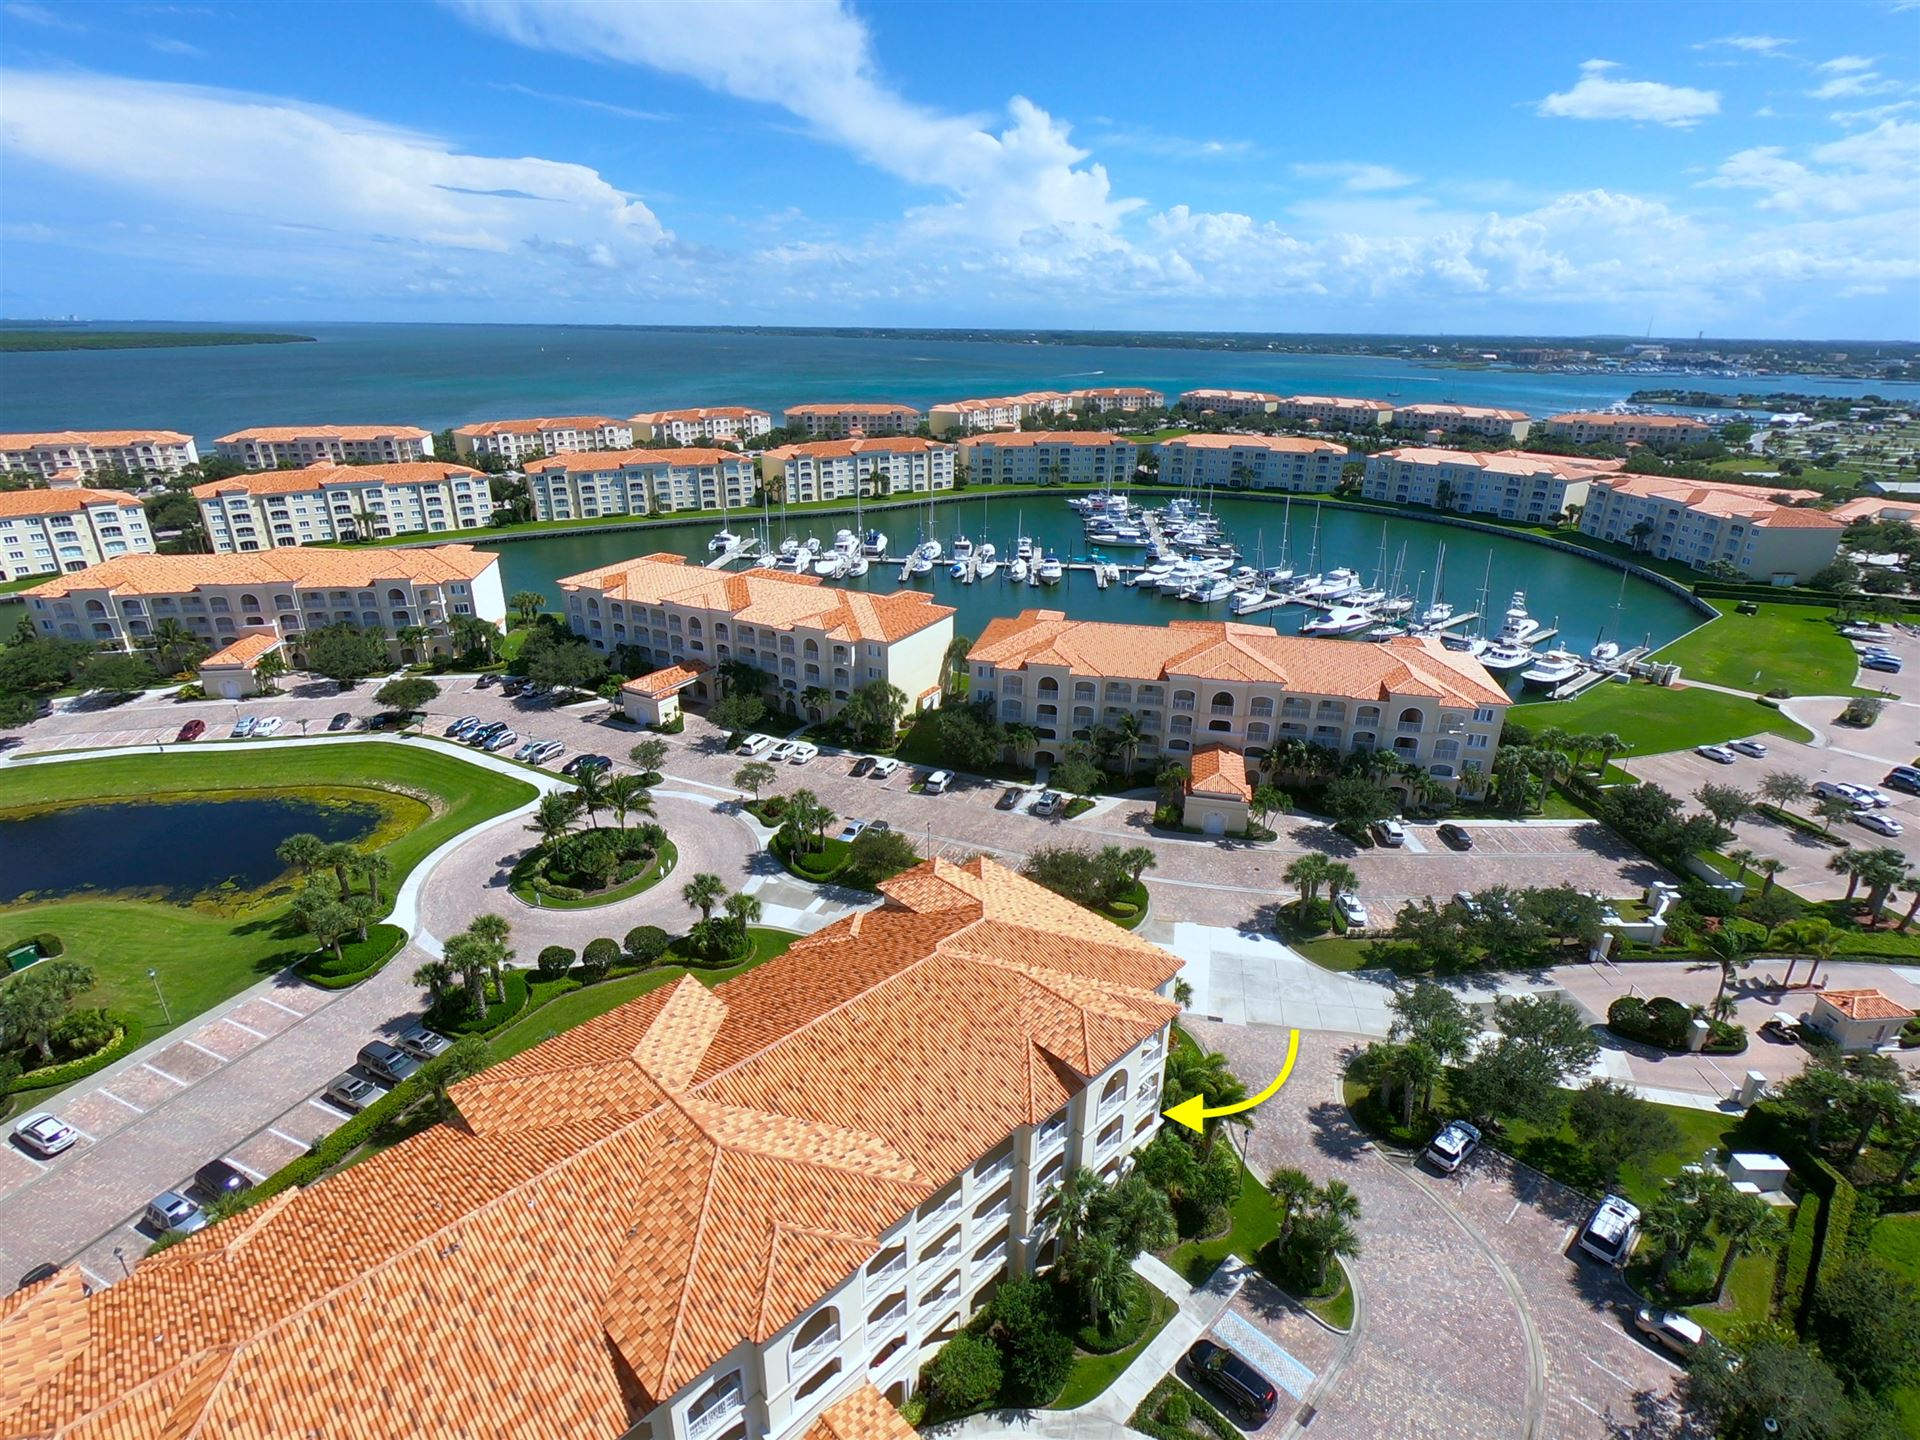 37 Harbour Isle Drive E #206, Fort Pierce, FL 34949 - #: RX-10594105